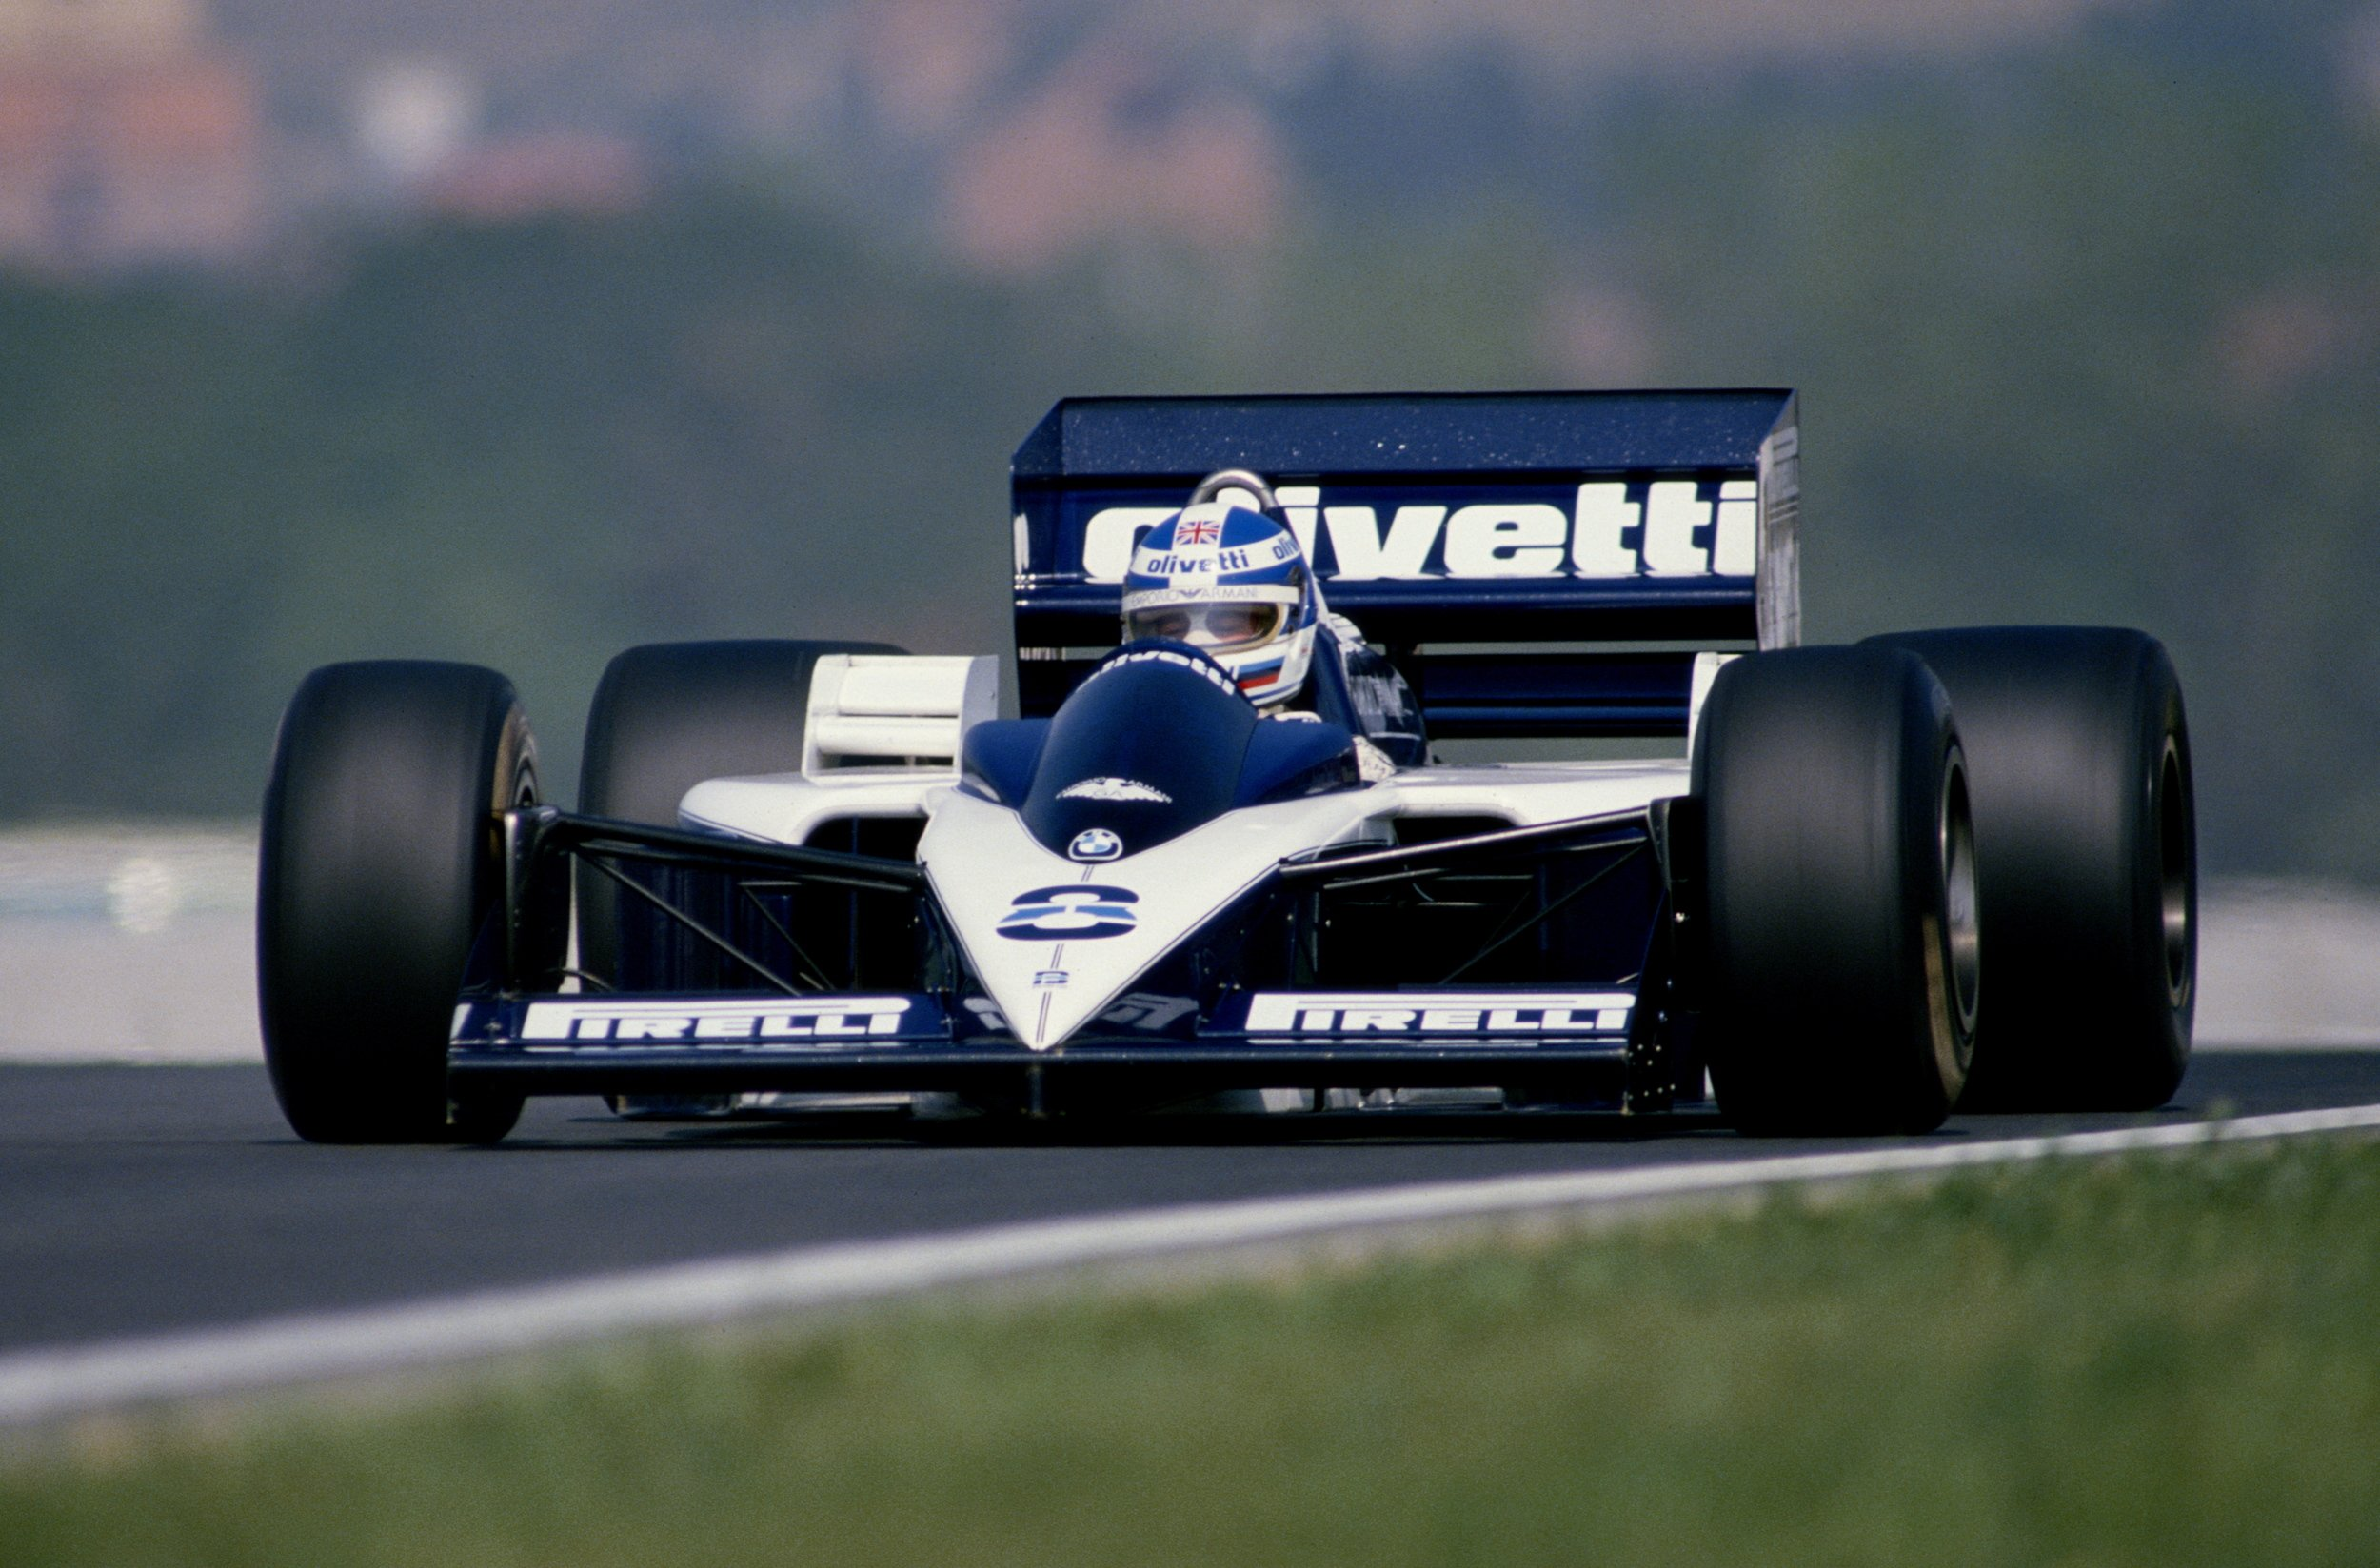 1986 Brabham Bt55 F 1 Formula Race Racing Wallpaper